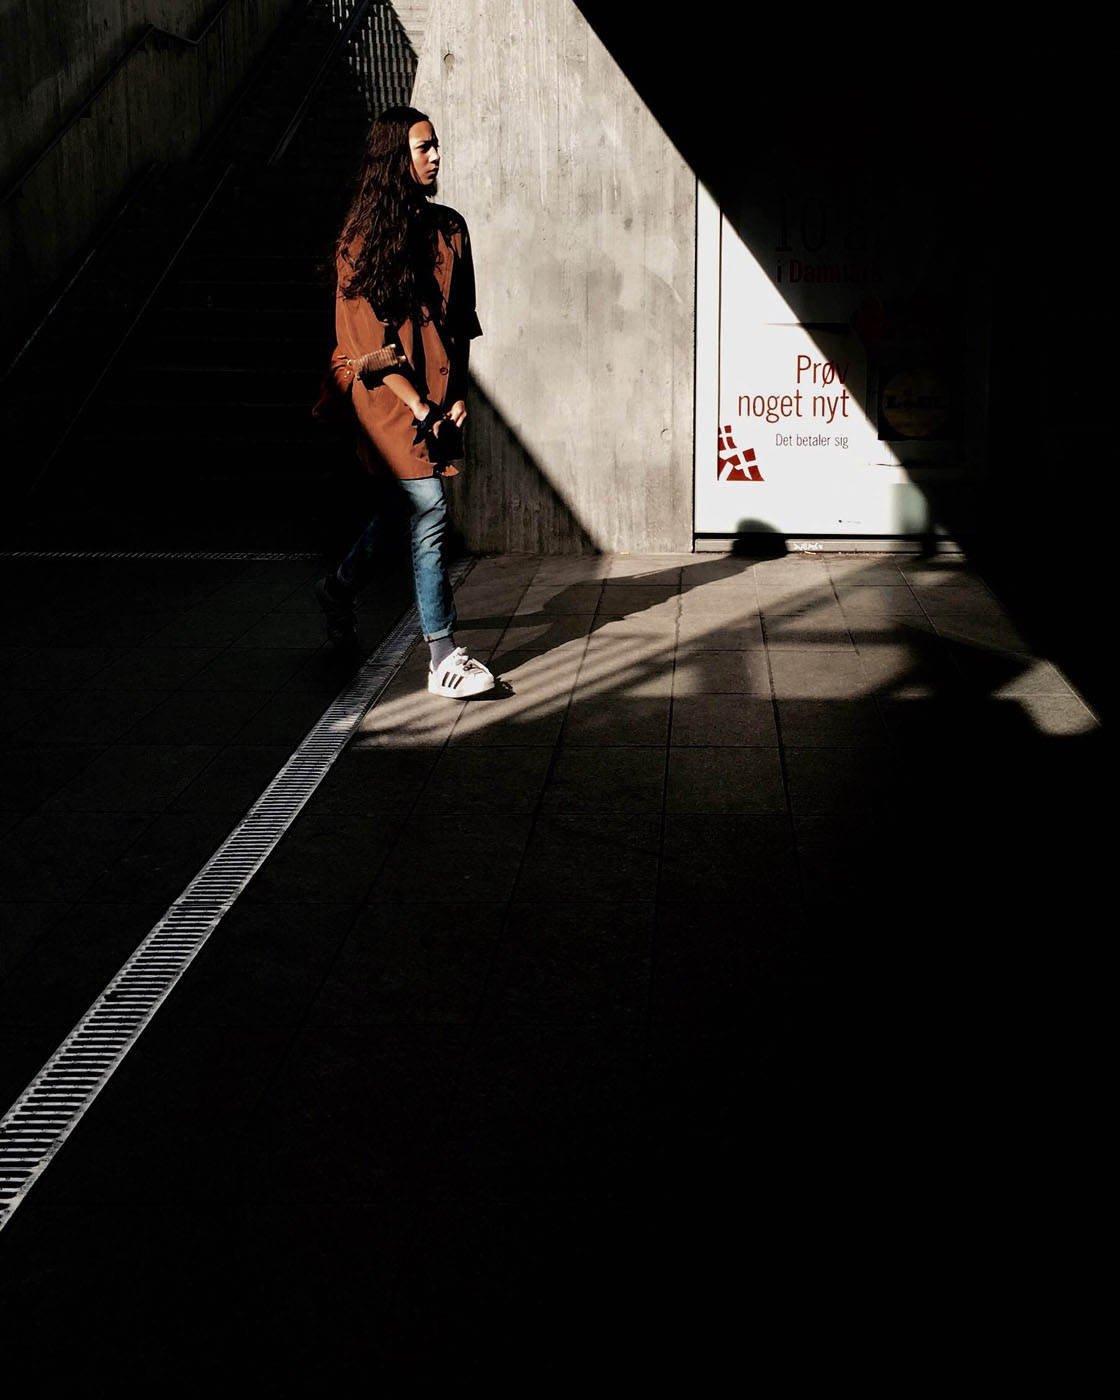 iPhone Street Photos Of Strangers 20 no script